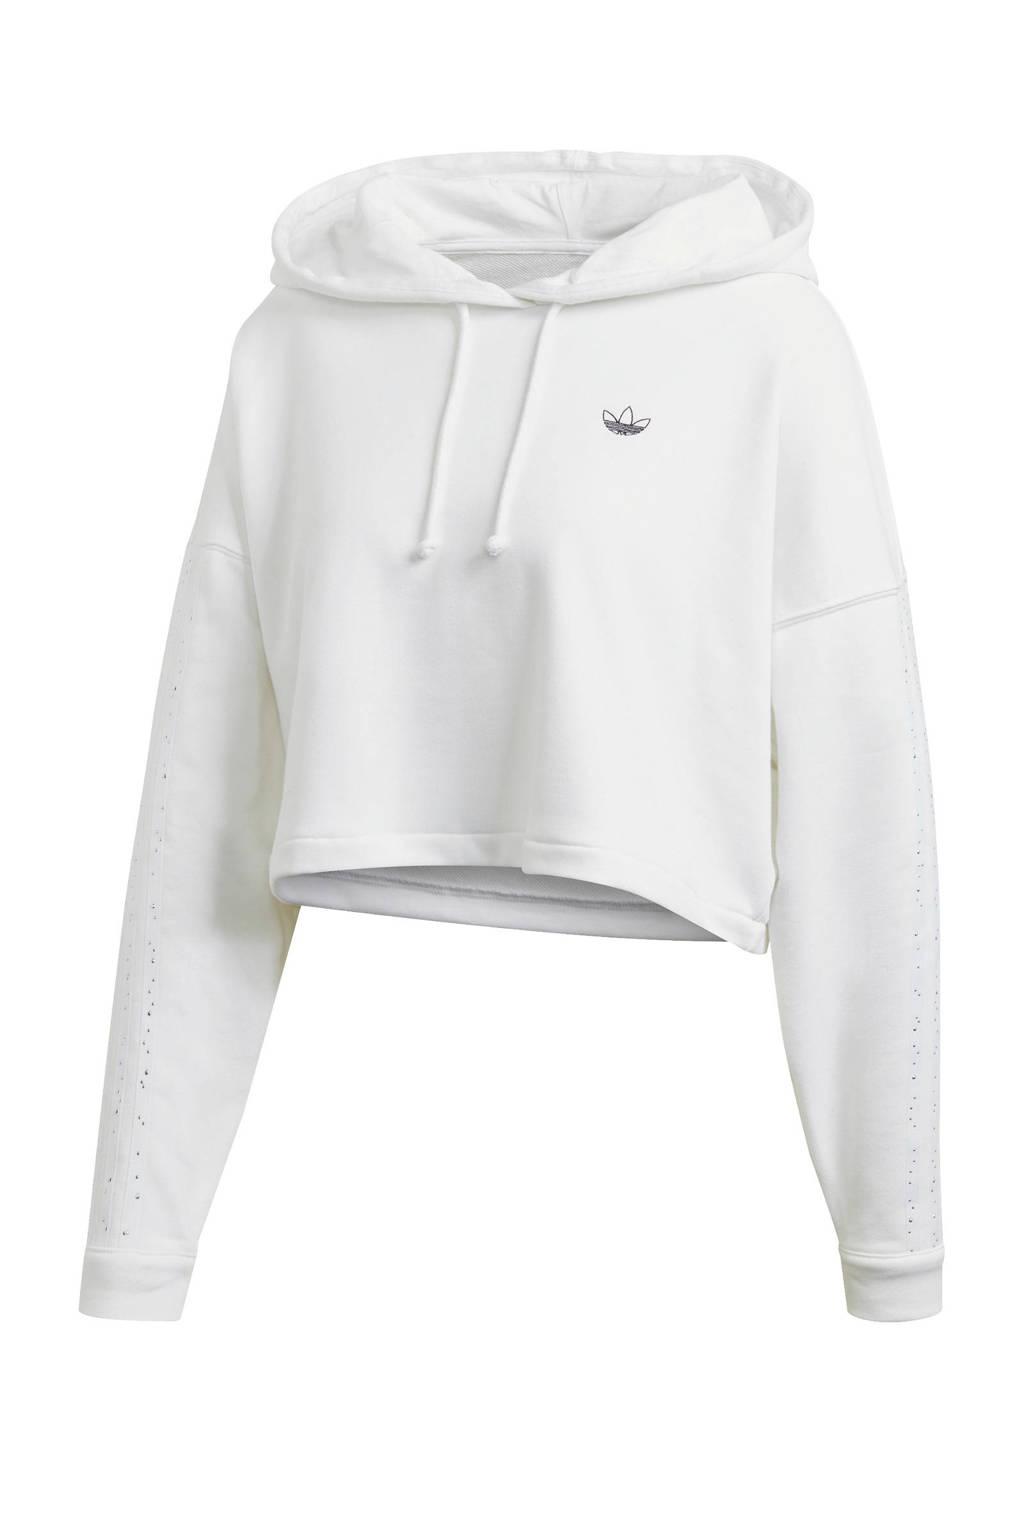 adidas Originals cropped hoodie wit, Wit